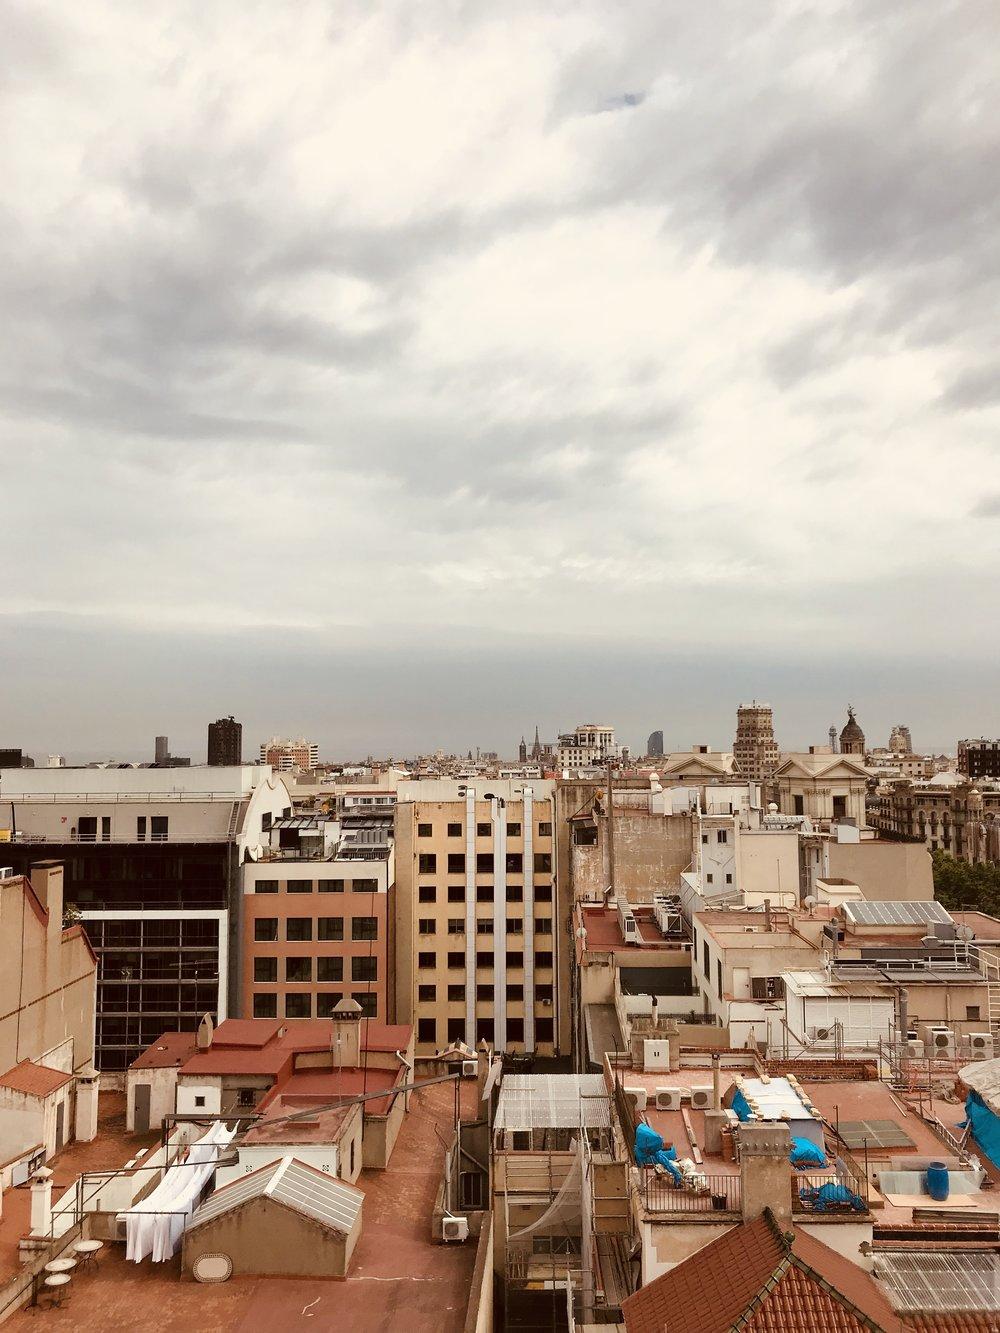 Un mes en Barcelona - 080518 - A photo journal